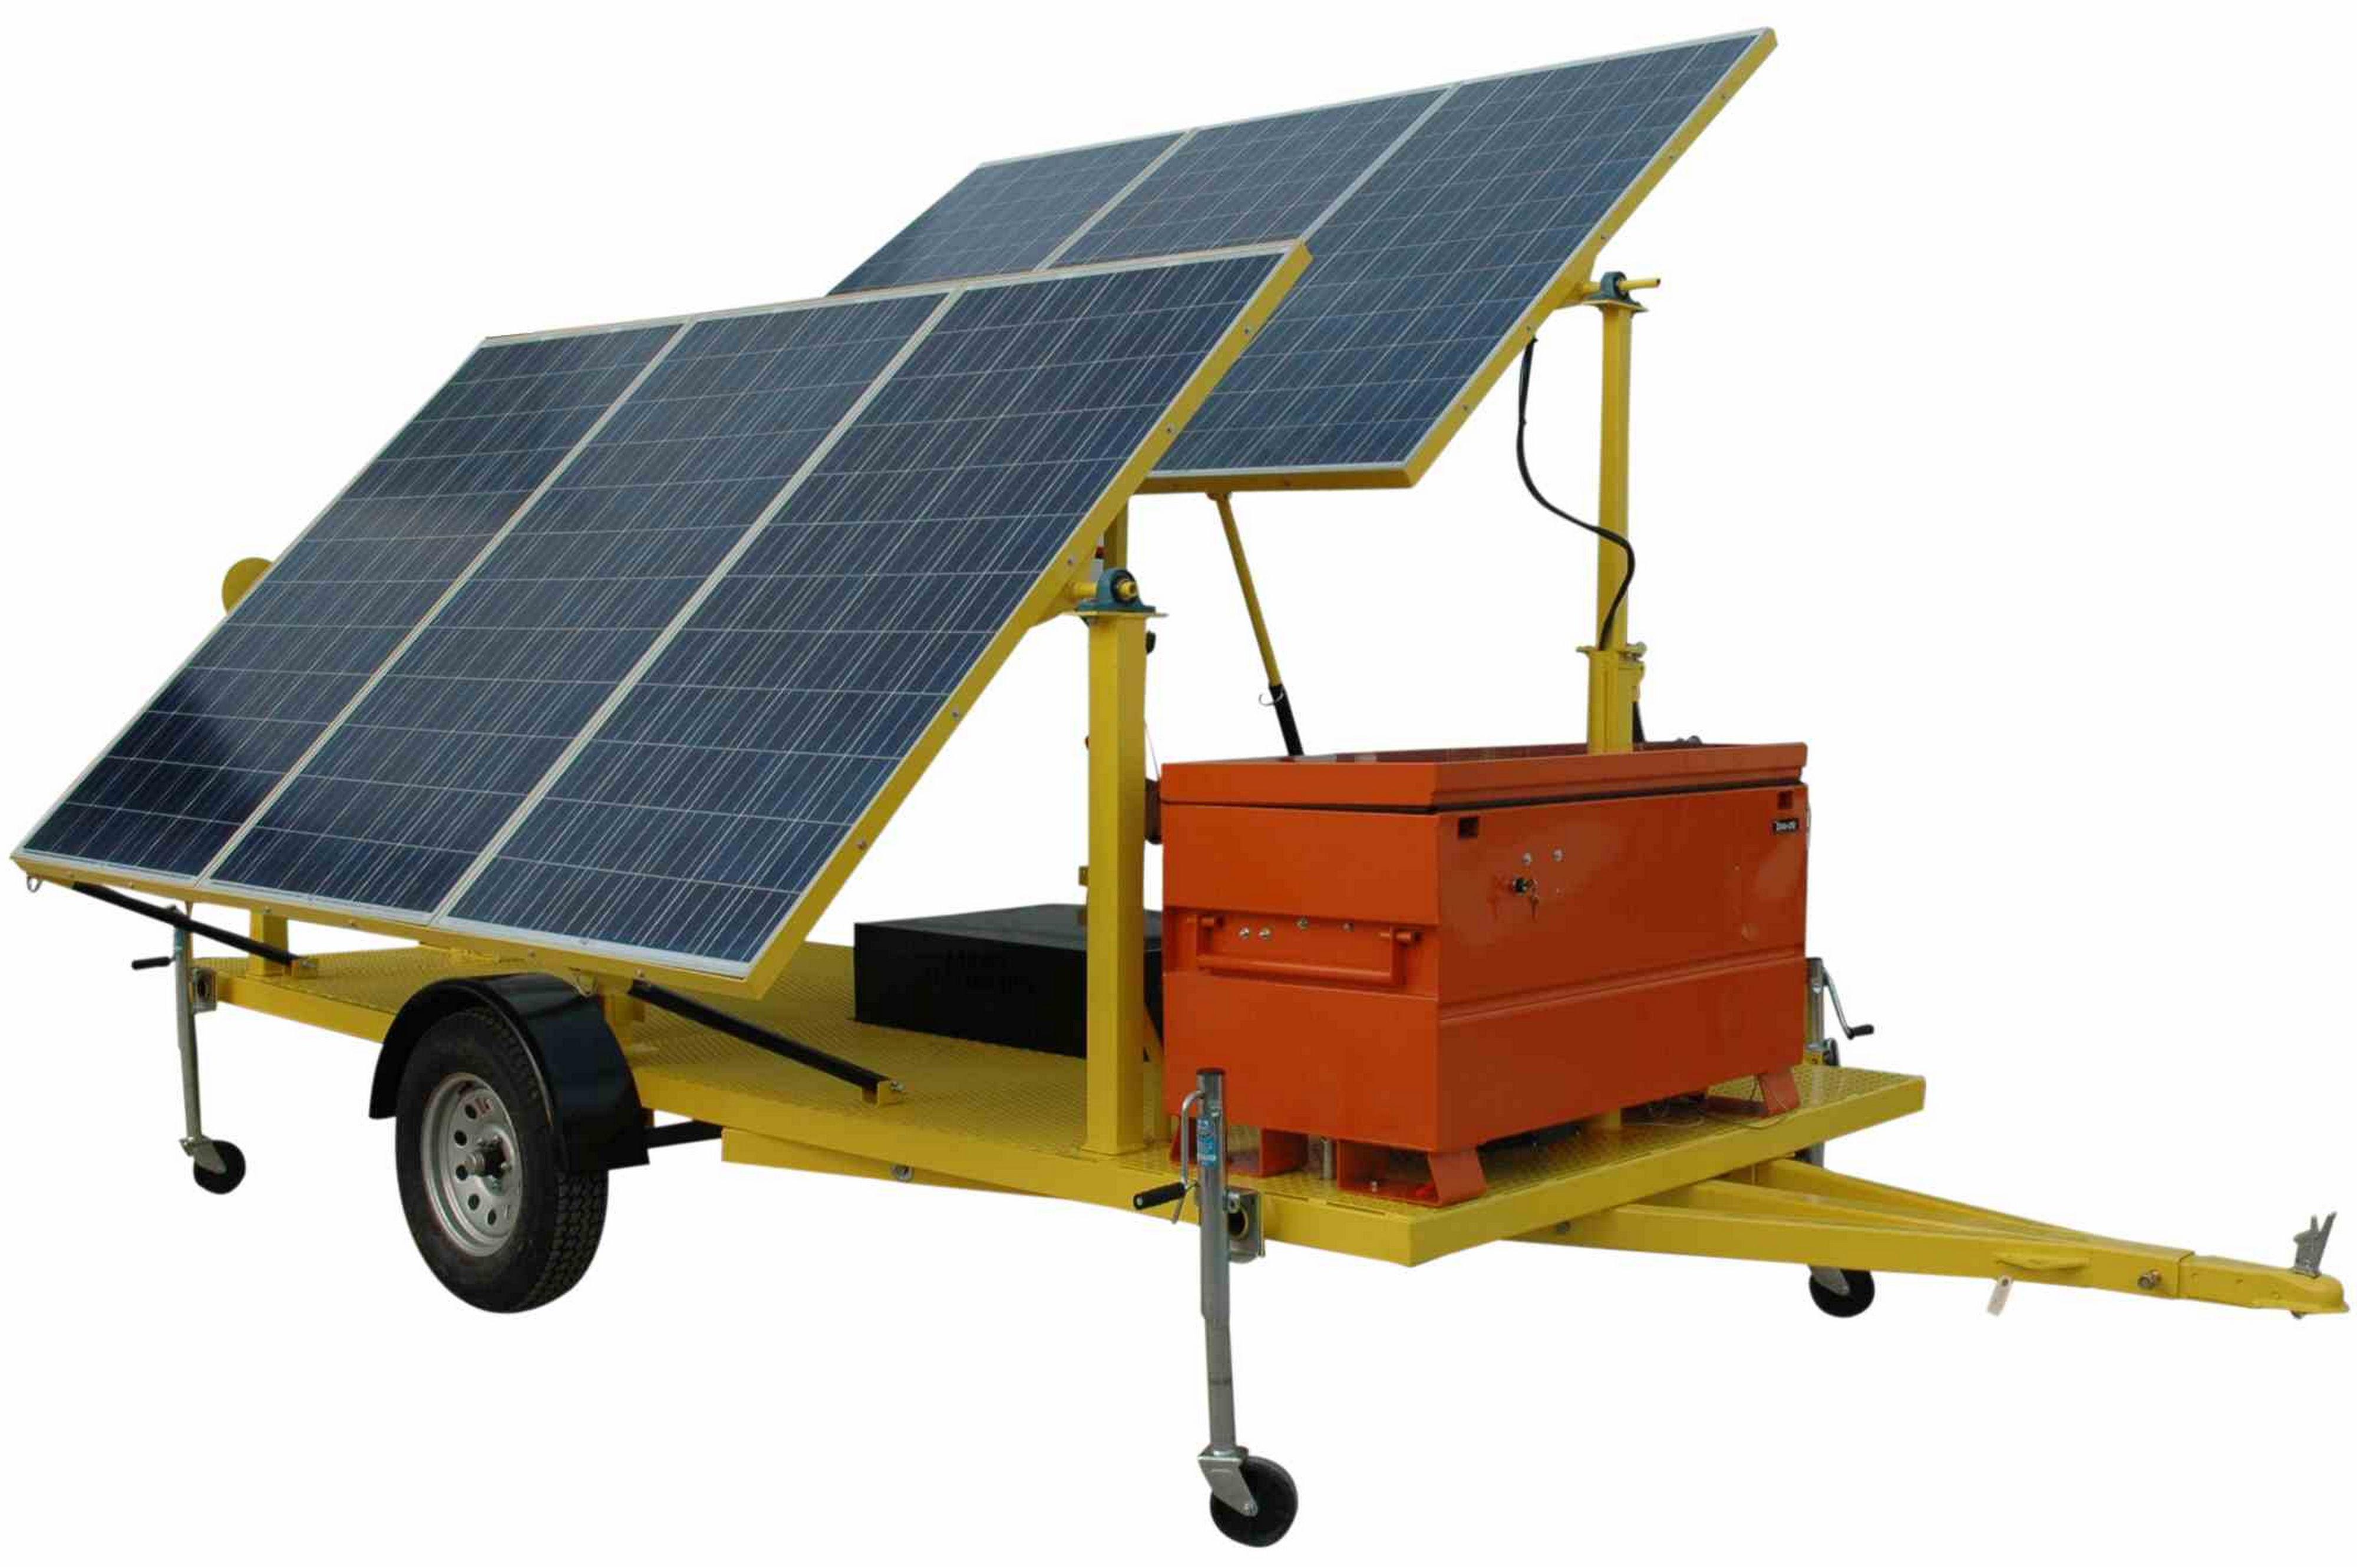 Larson Electronics 1 8kw Solar Power Generator 120v Output 6 300 Watt Panels Completely Solar No Fuel Needed